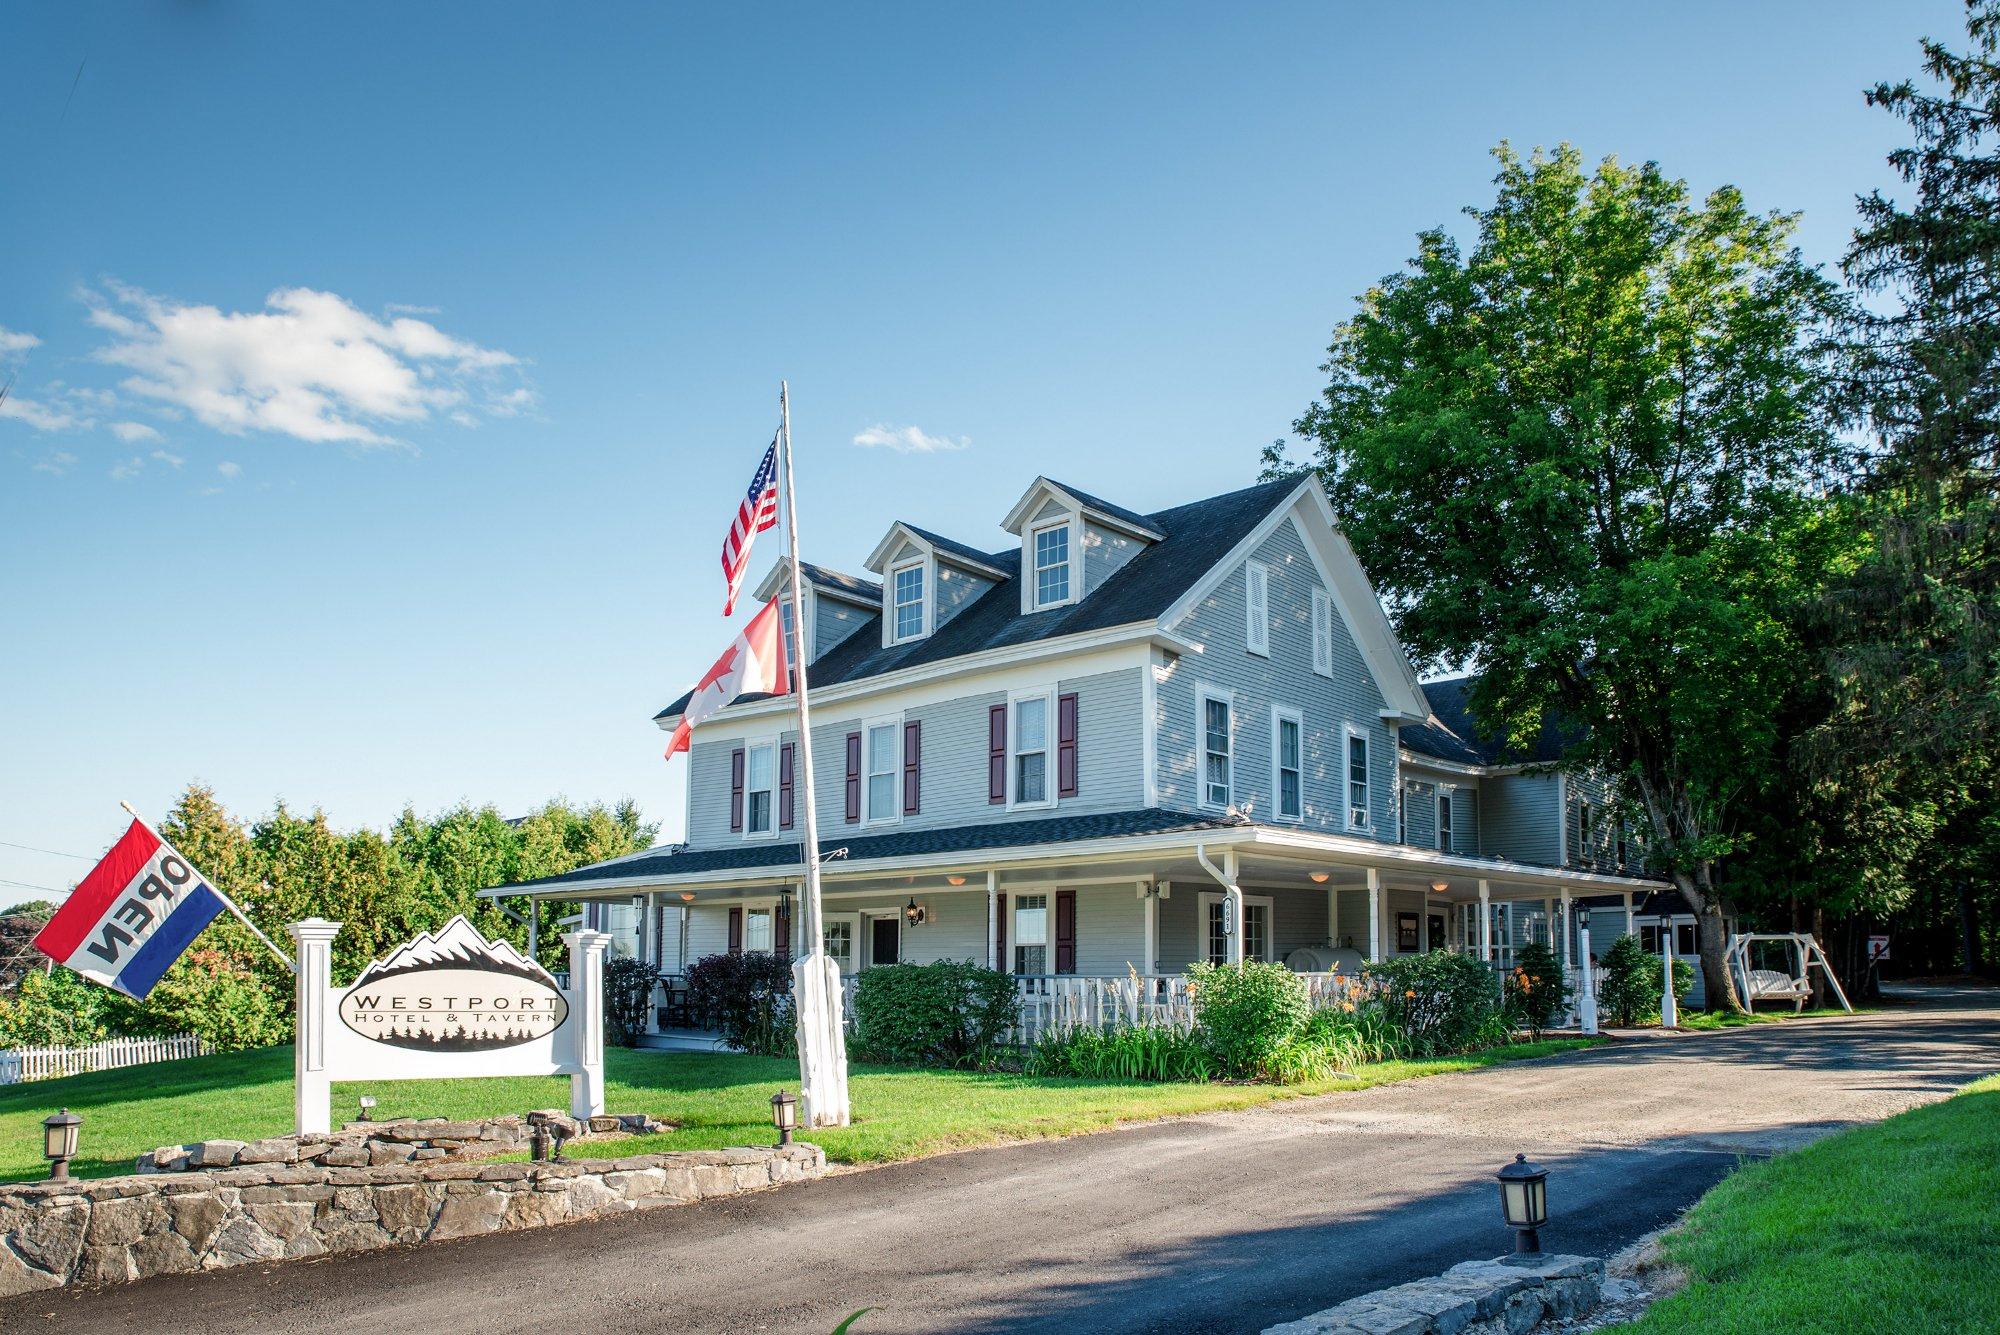 Westport Hotel